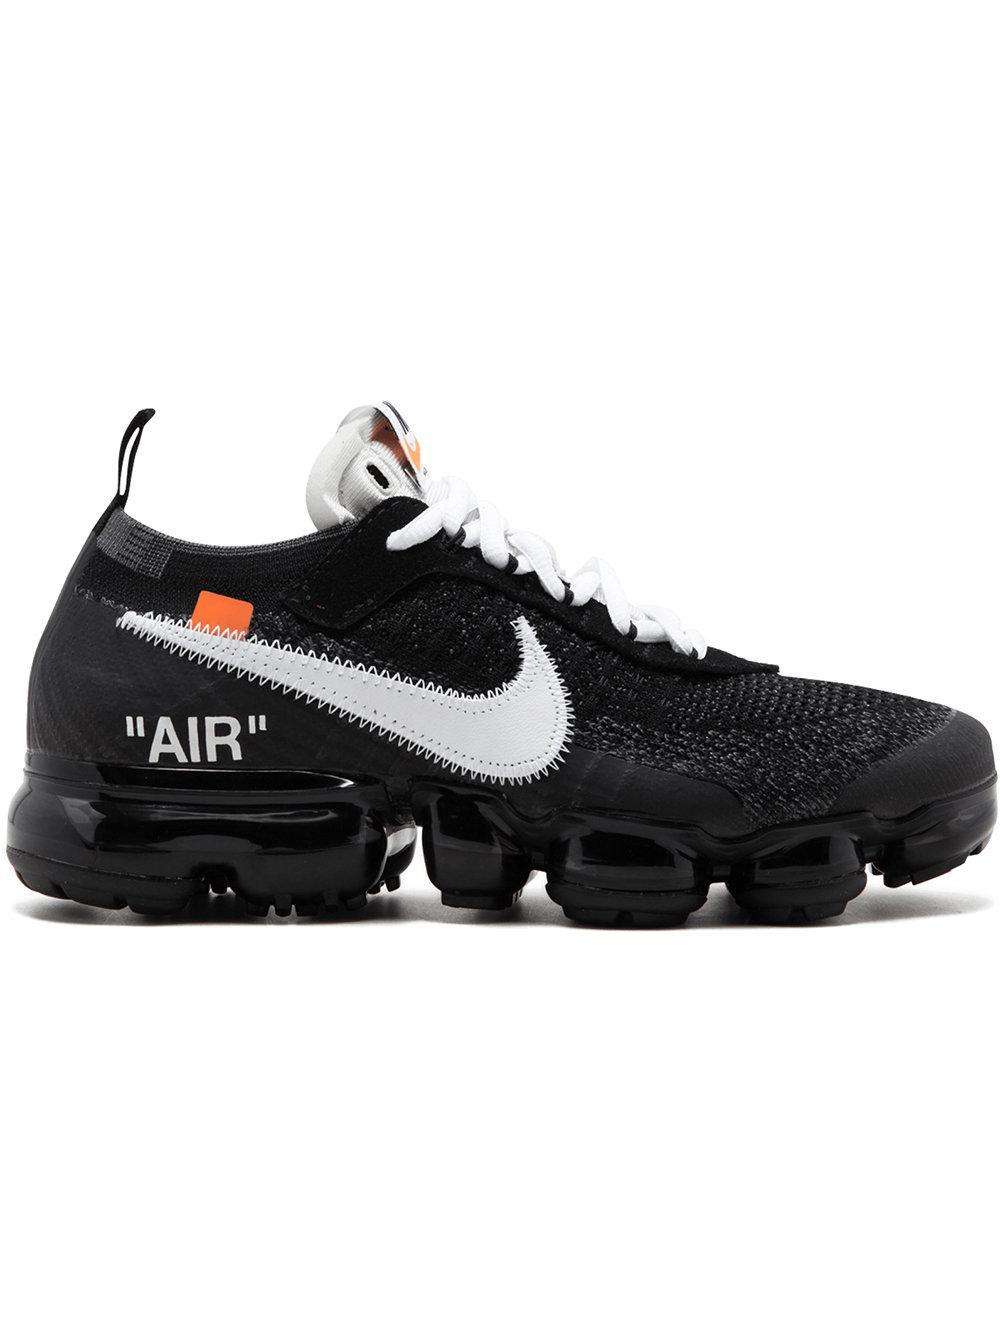 bf92750dac Nike 'The 10: Air Vapormax Fk' Sneakers - Schwarz In Black | ModeSens